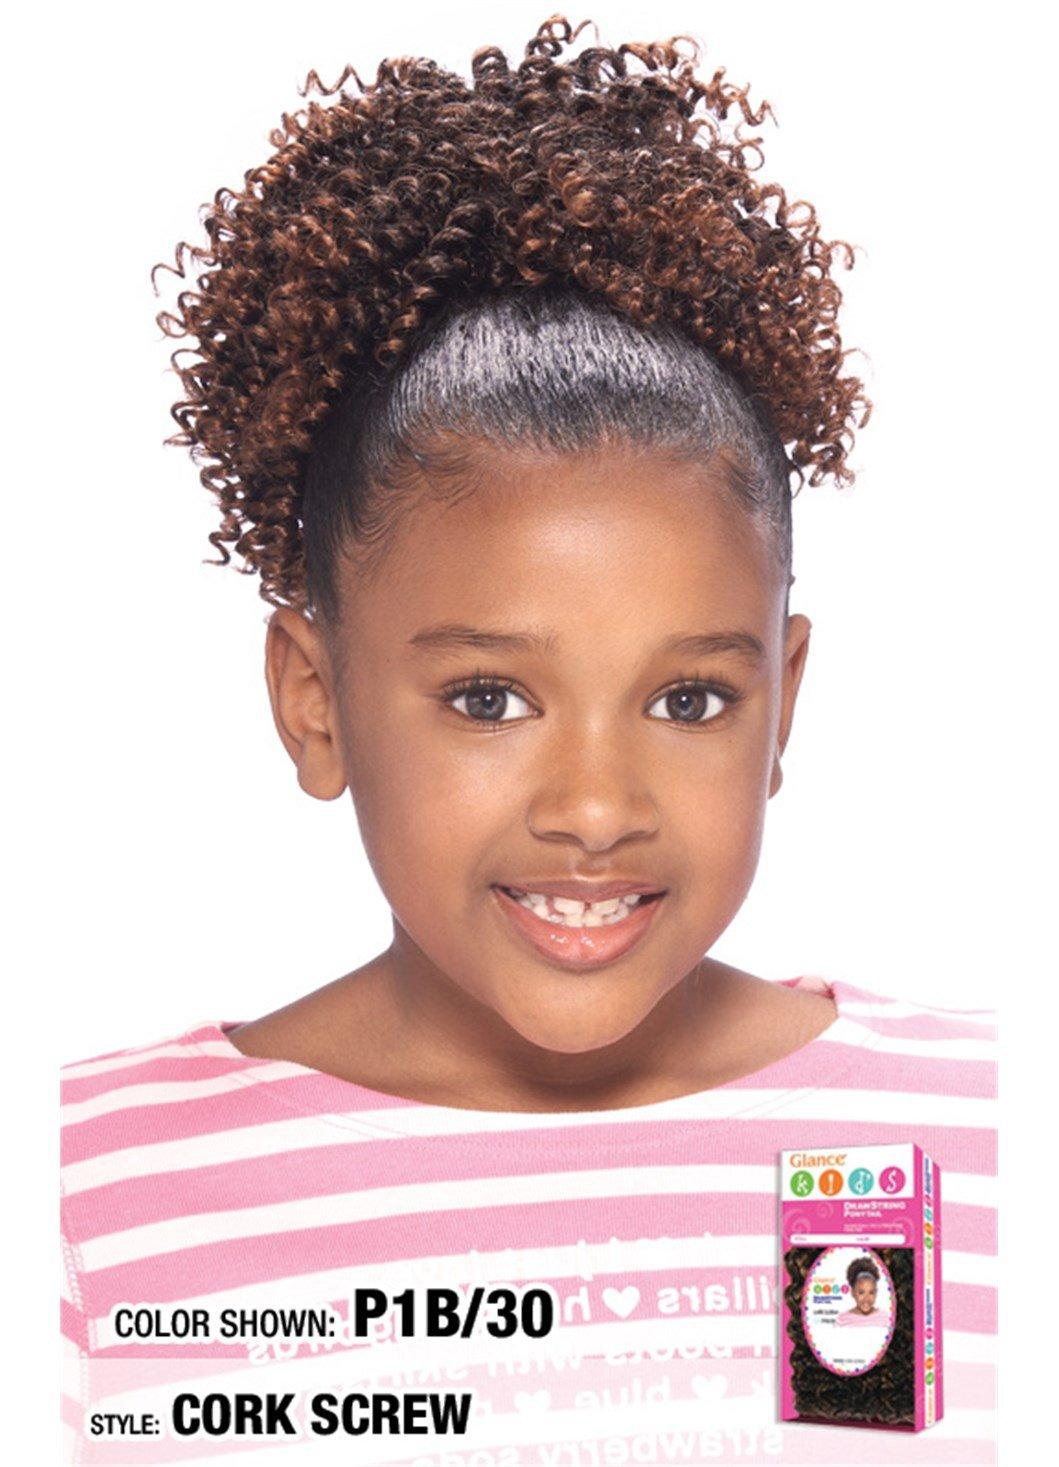 Amazon Com Model Model Glance Kids Drawstring Ponytail Cork Screw Color 2 Hairpieces Beauty